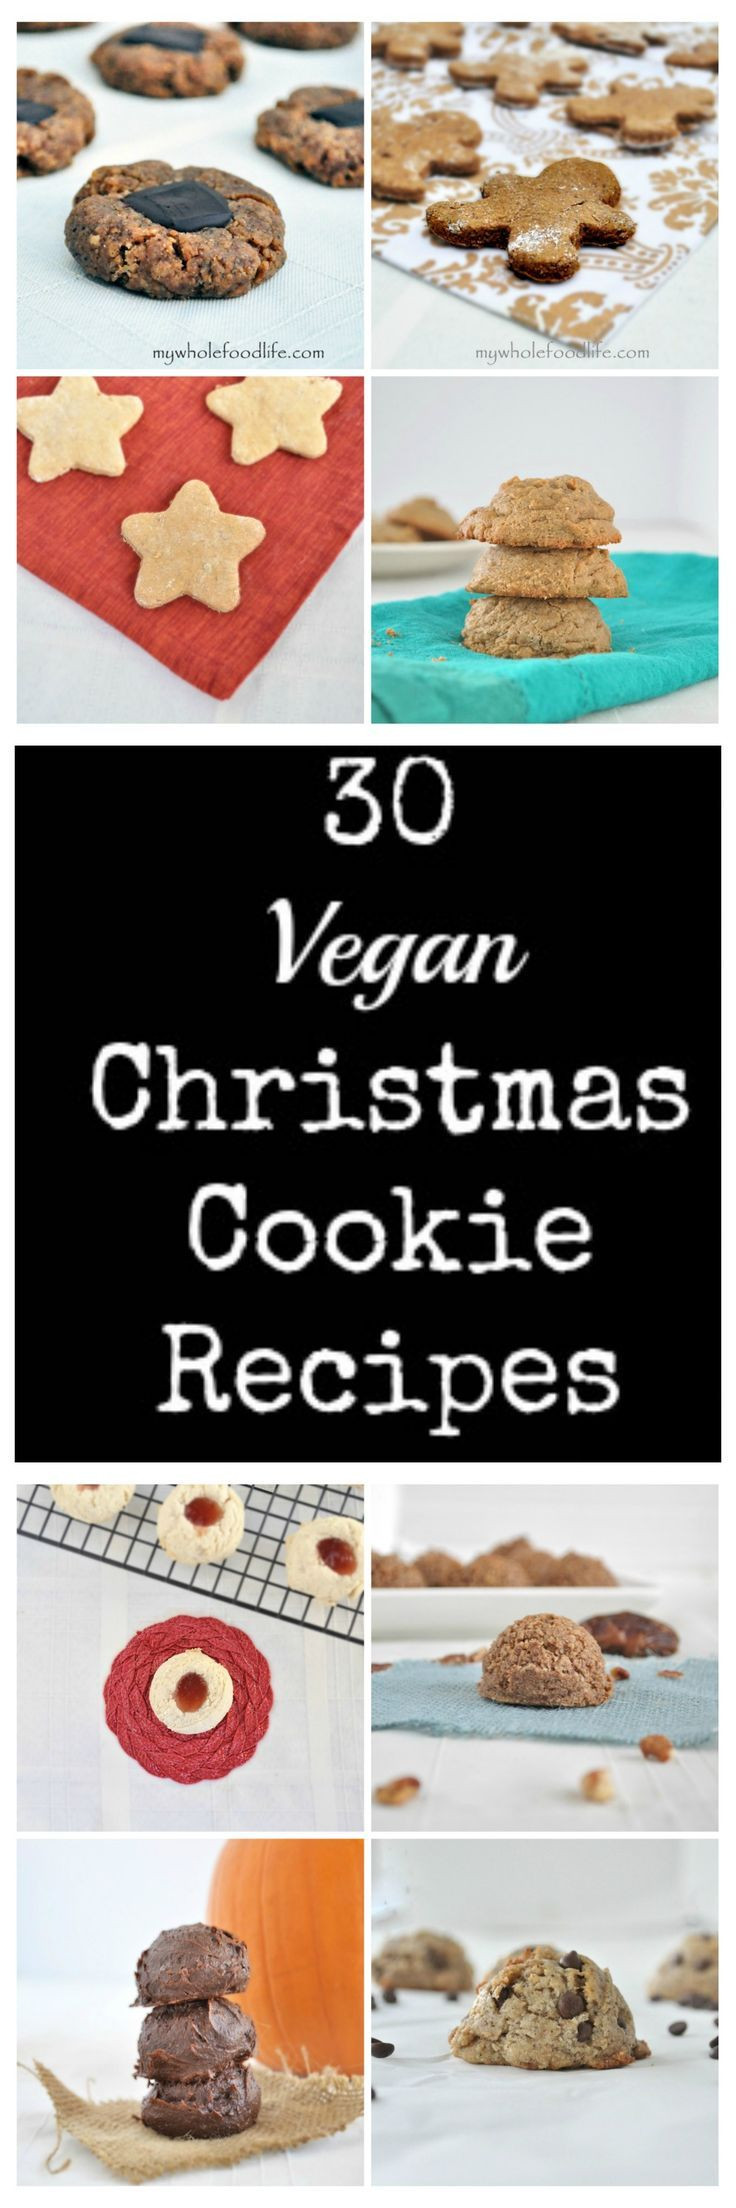 Vegan Christmas Cookie Recipes  17 Best ideas about Vegan Christmas Cookies on Pinterest